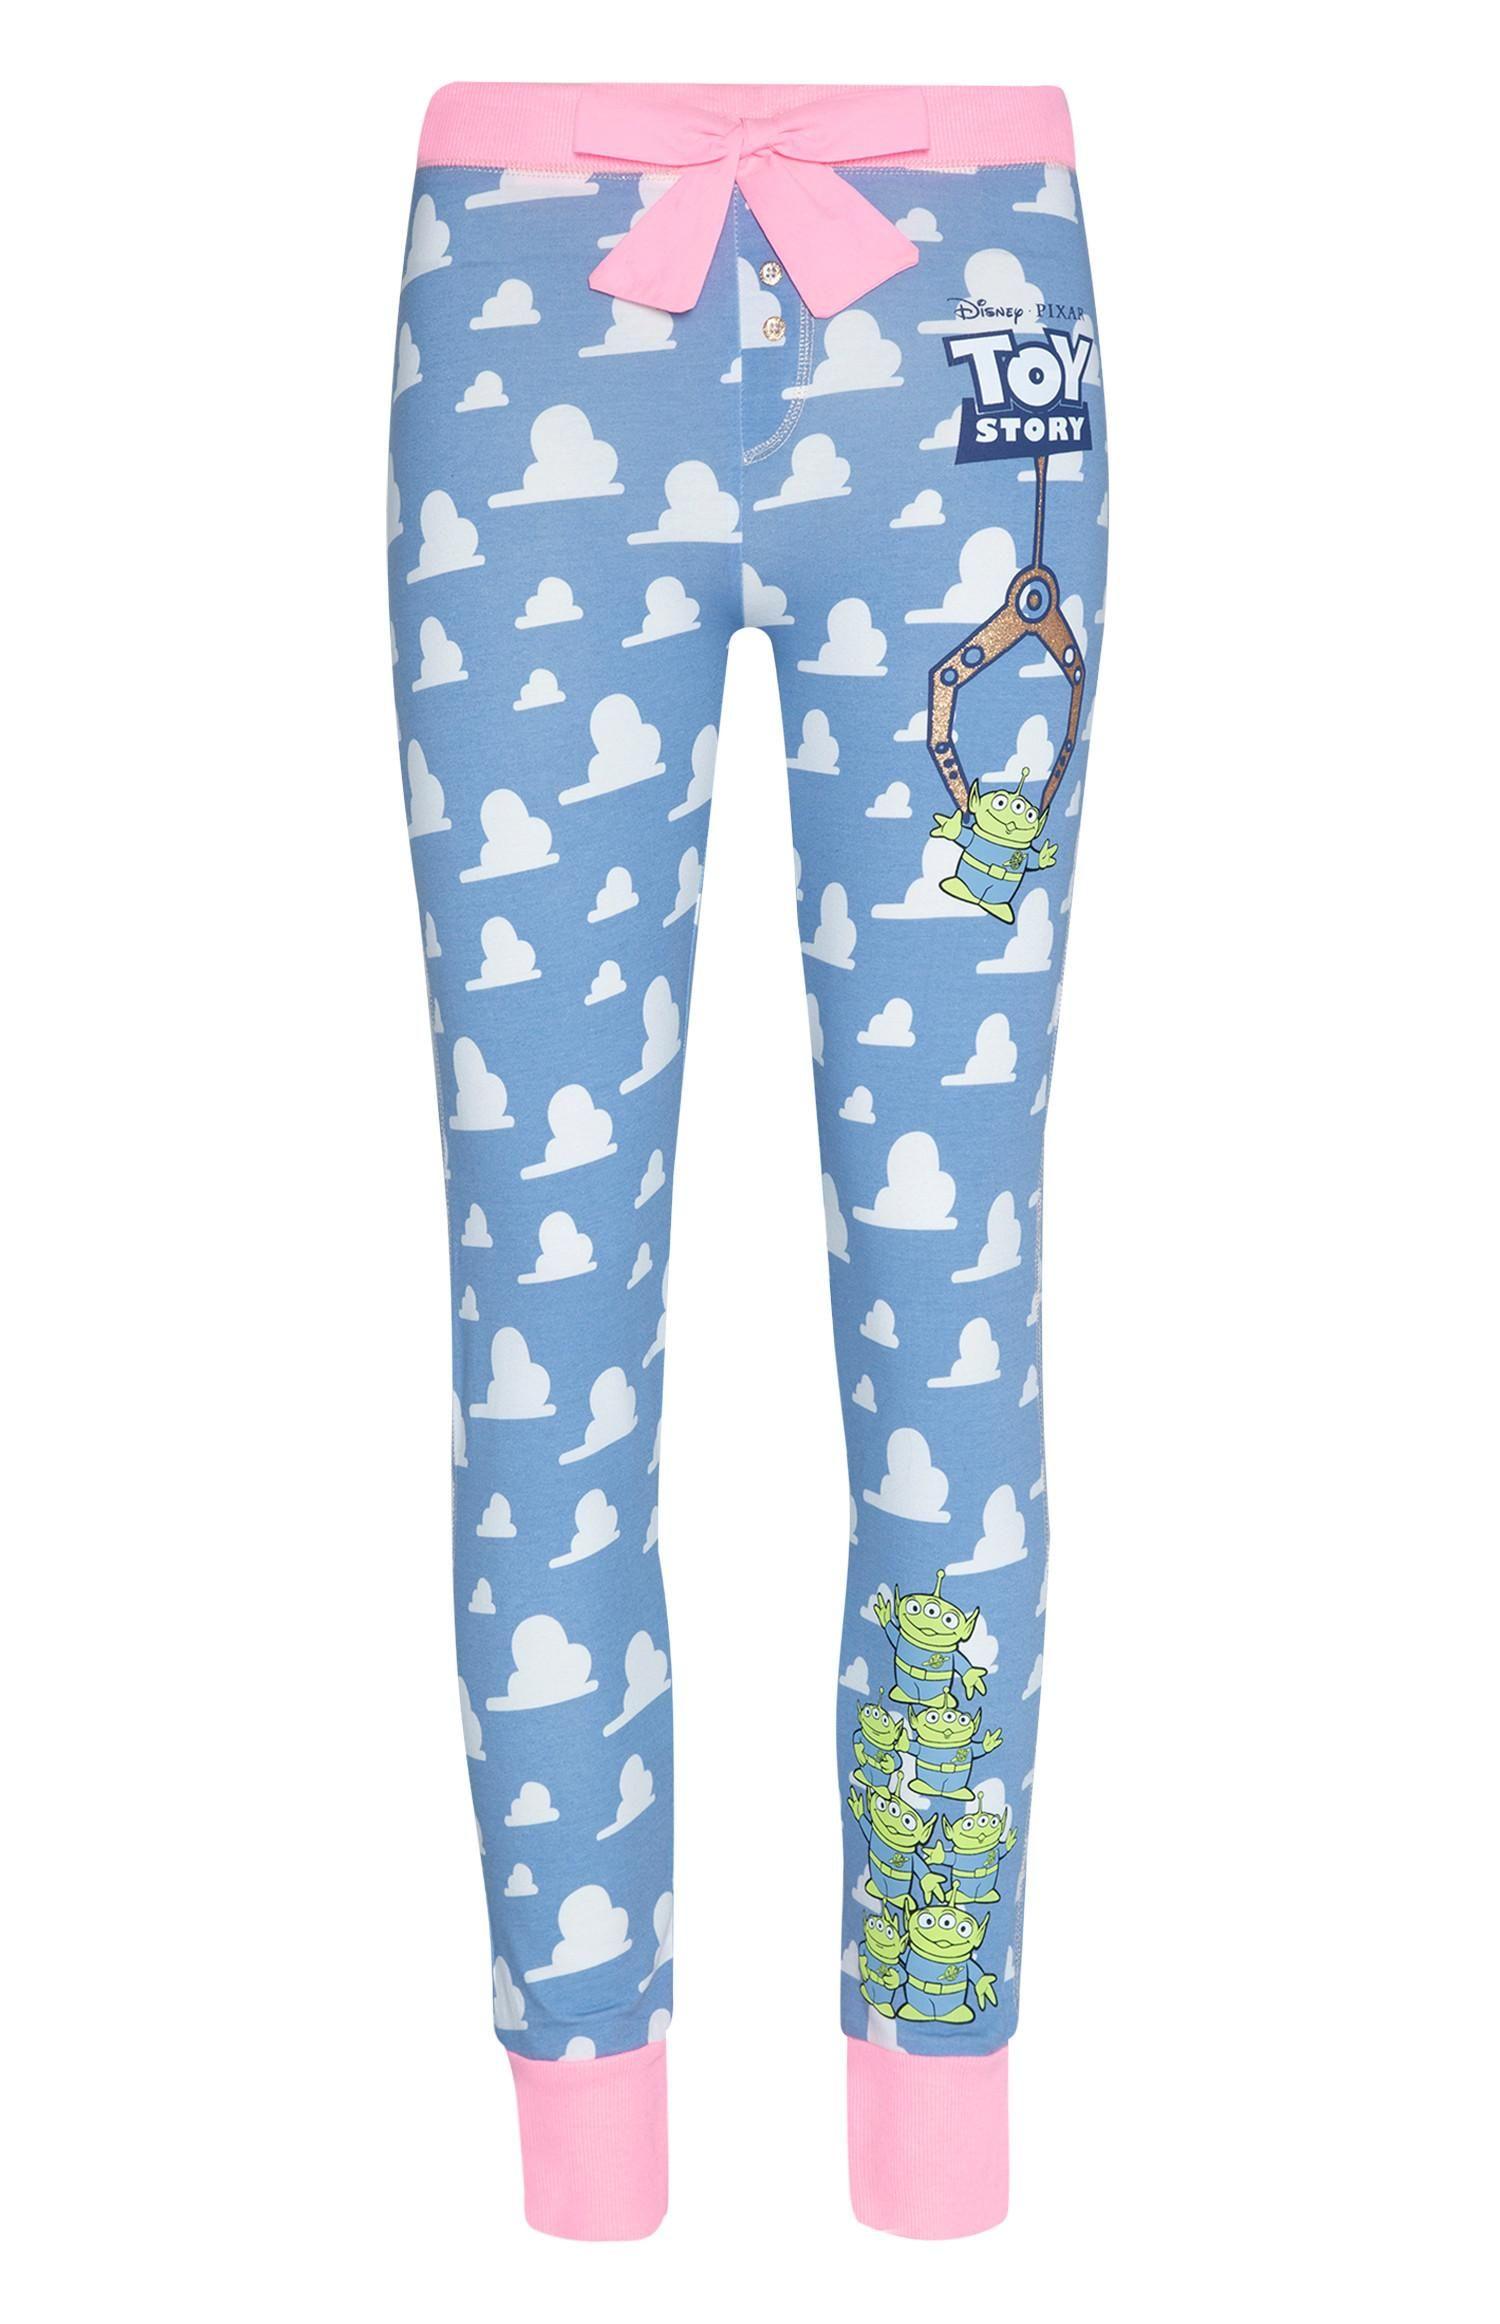 Disney TOY STORY Pyjamas Pjs Fleece Size XS   6-8  Primark Ladies New